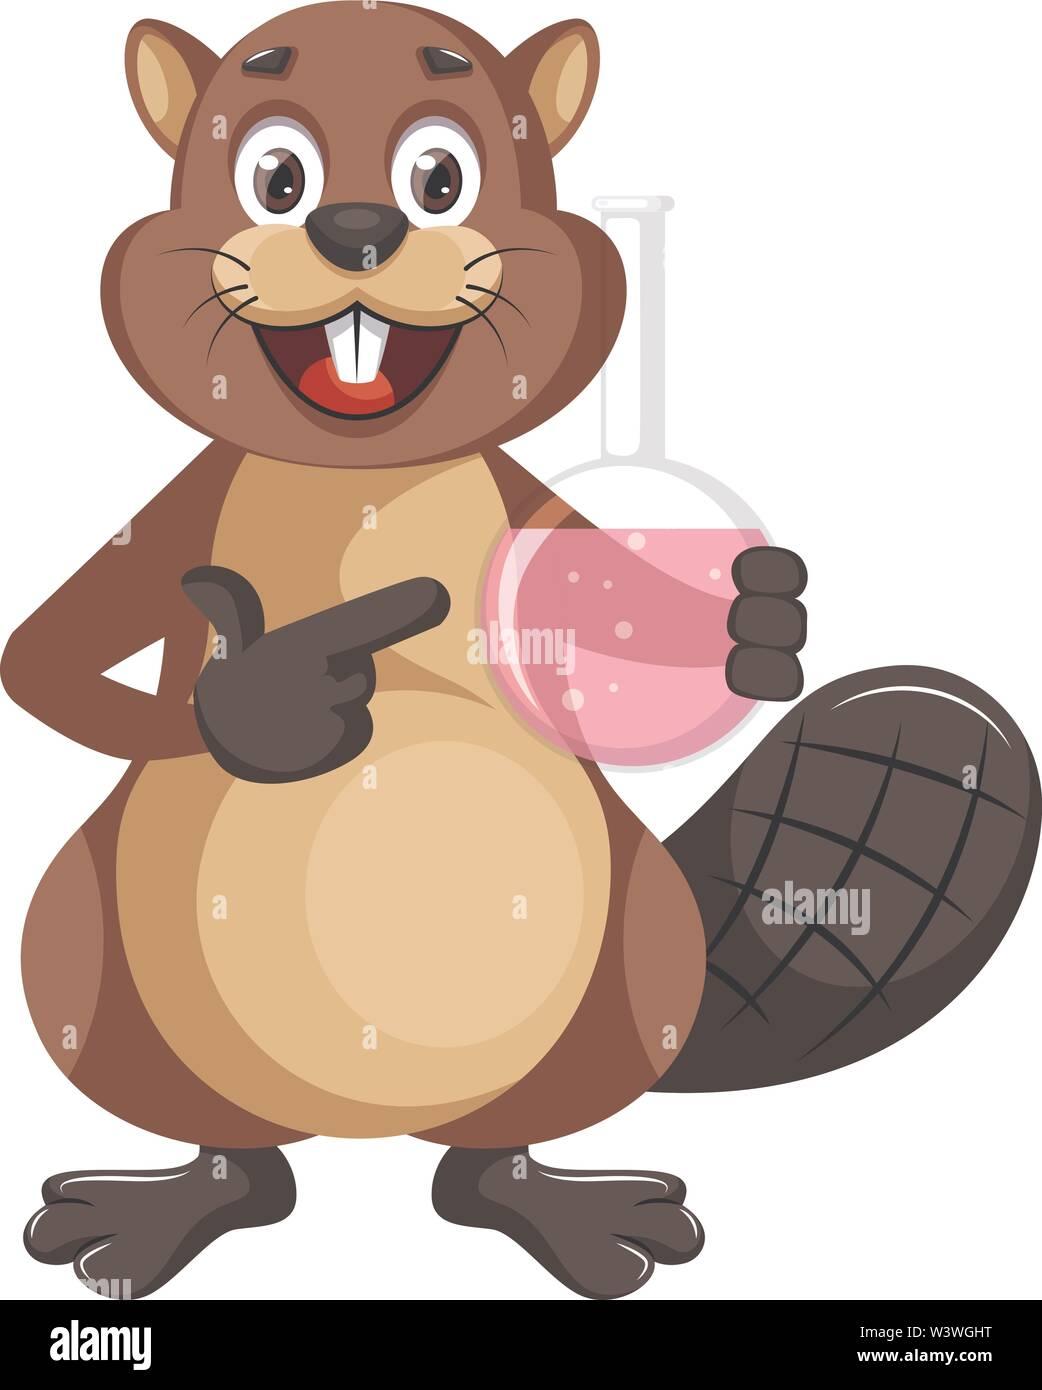 Beaver holding tube, illustration, vector on white background. - Stock Image